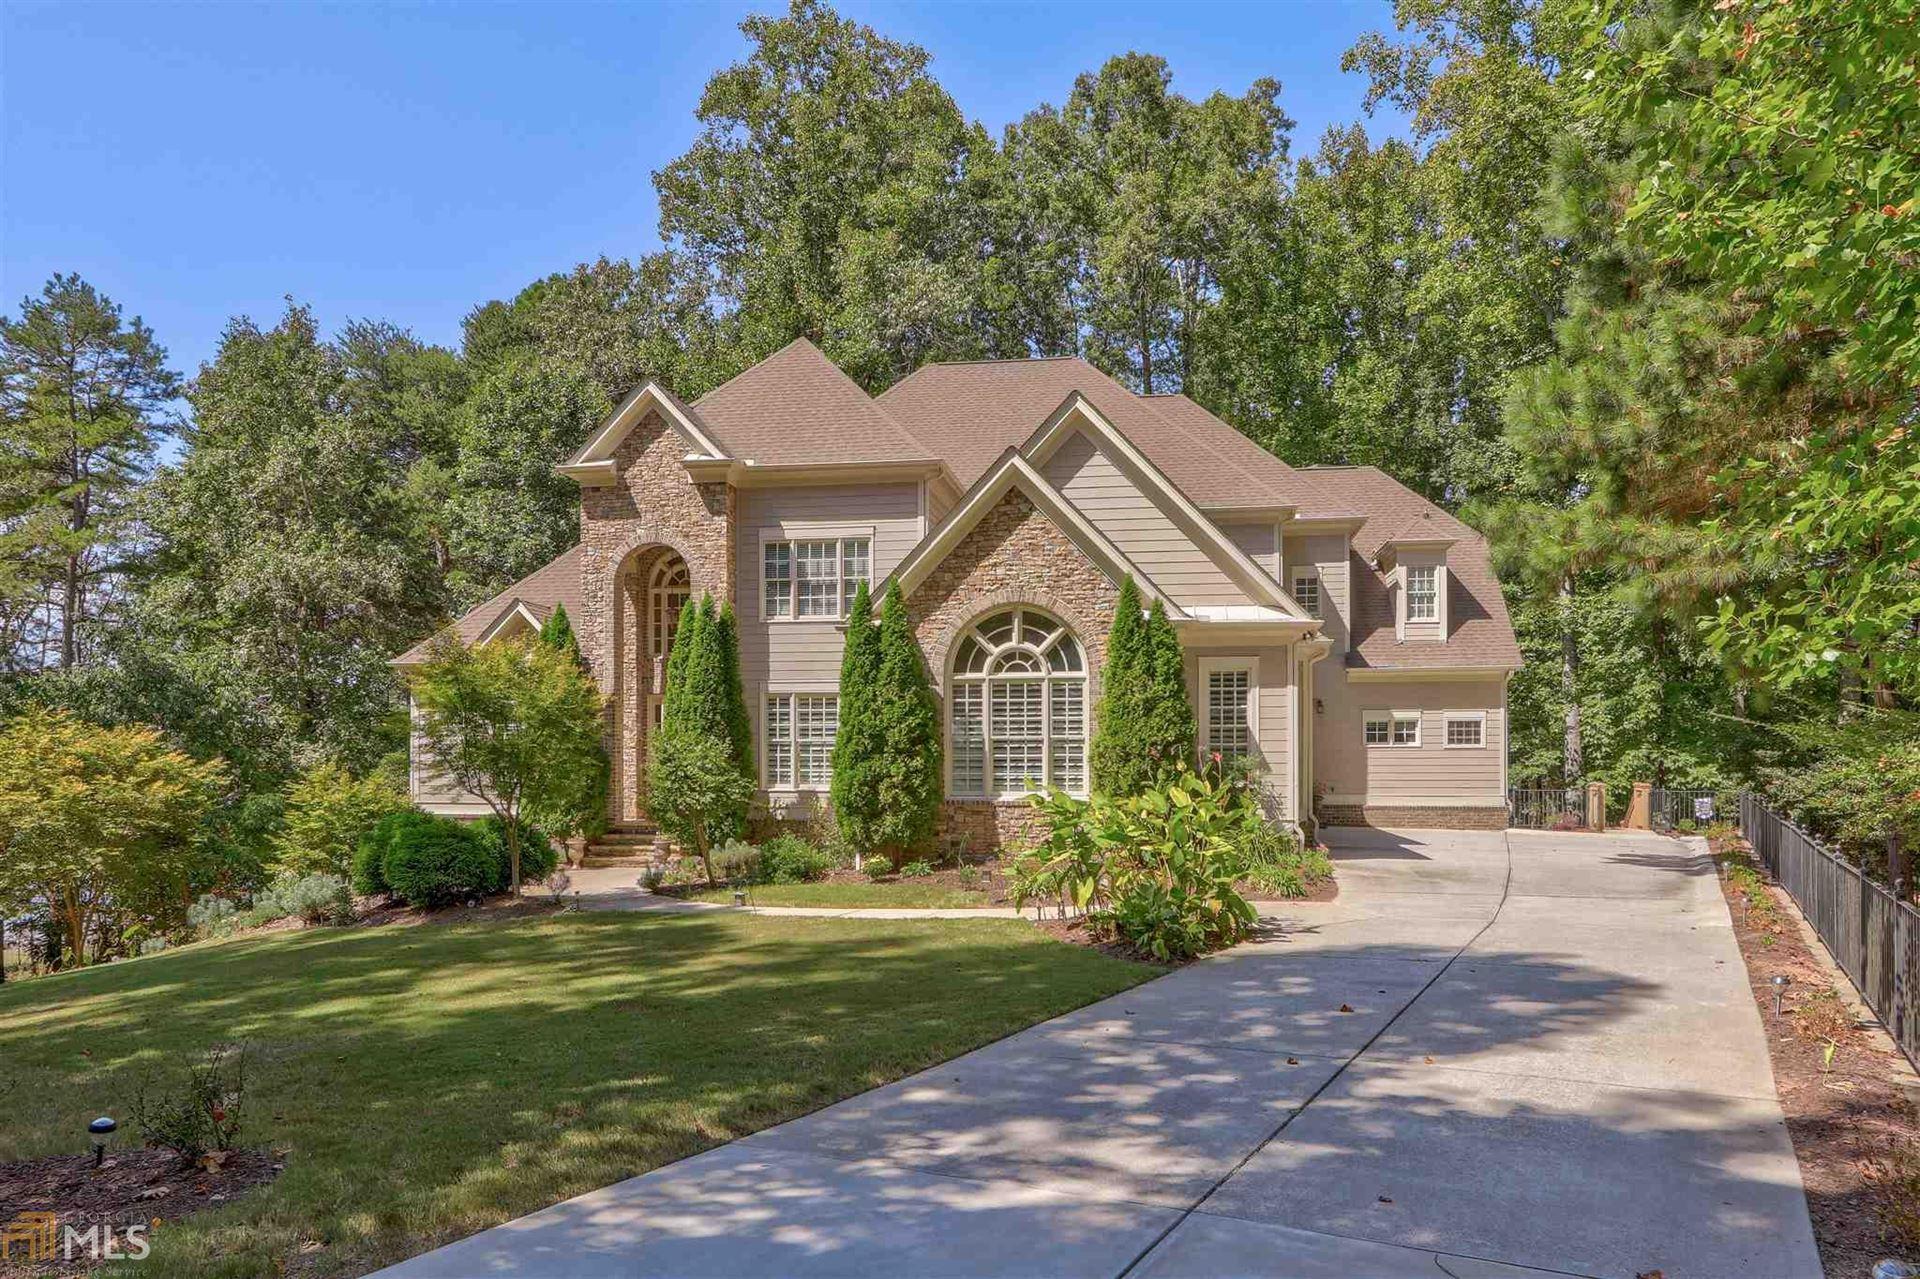 3187 Lake Ranch Dr, Gainesville, GA 30506 - #: 8574034